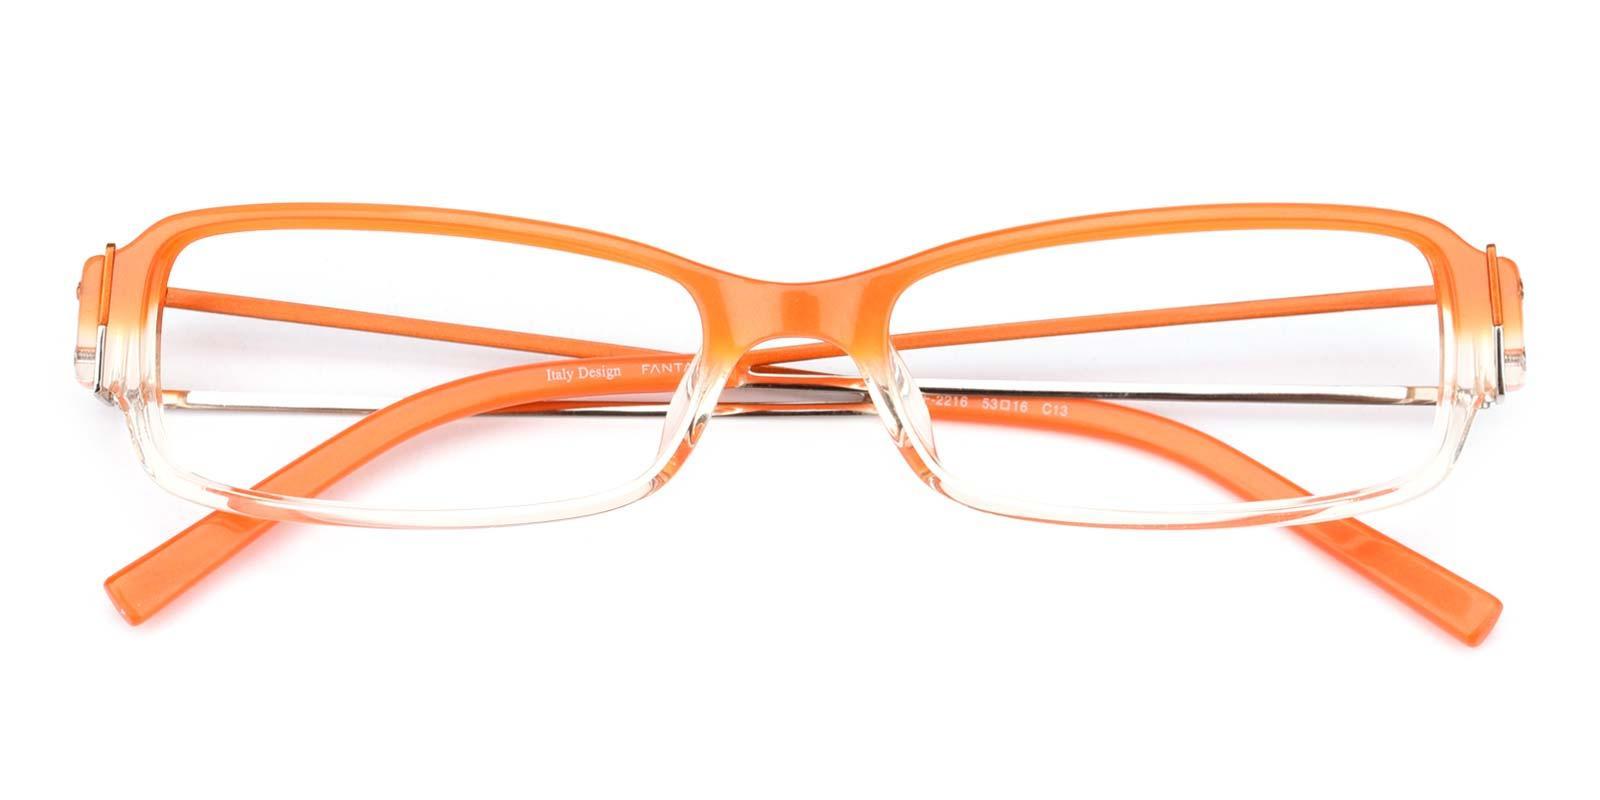 Fanta-Orange-Rectangle-Plastic-Eyeglasses-detail